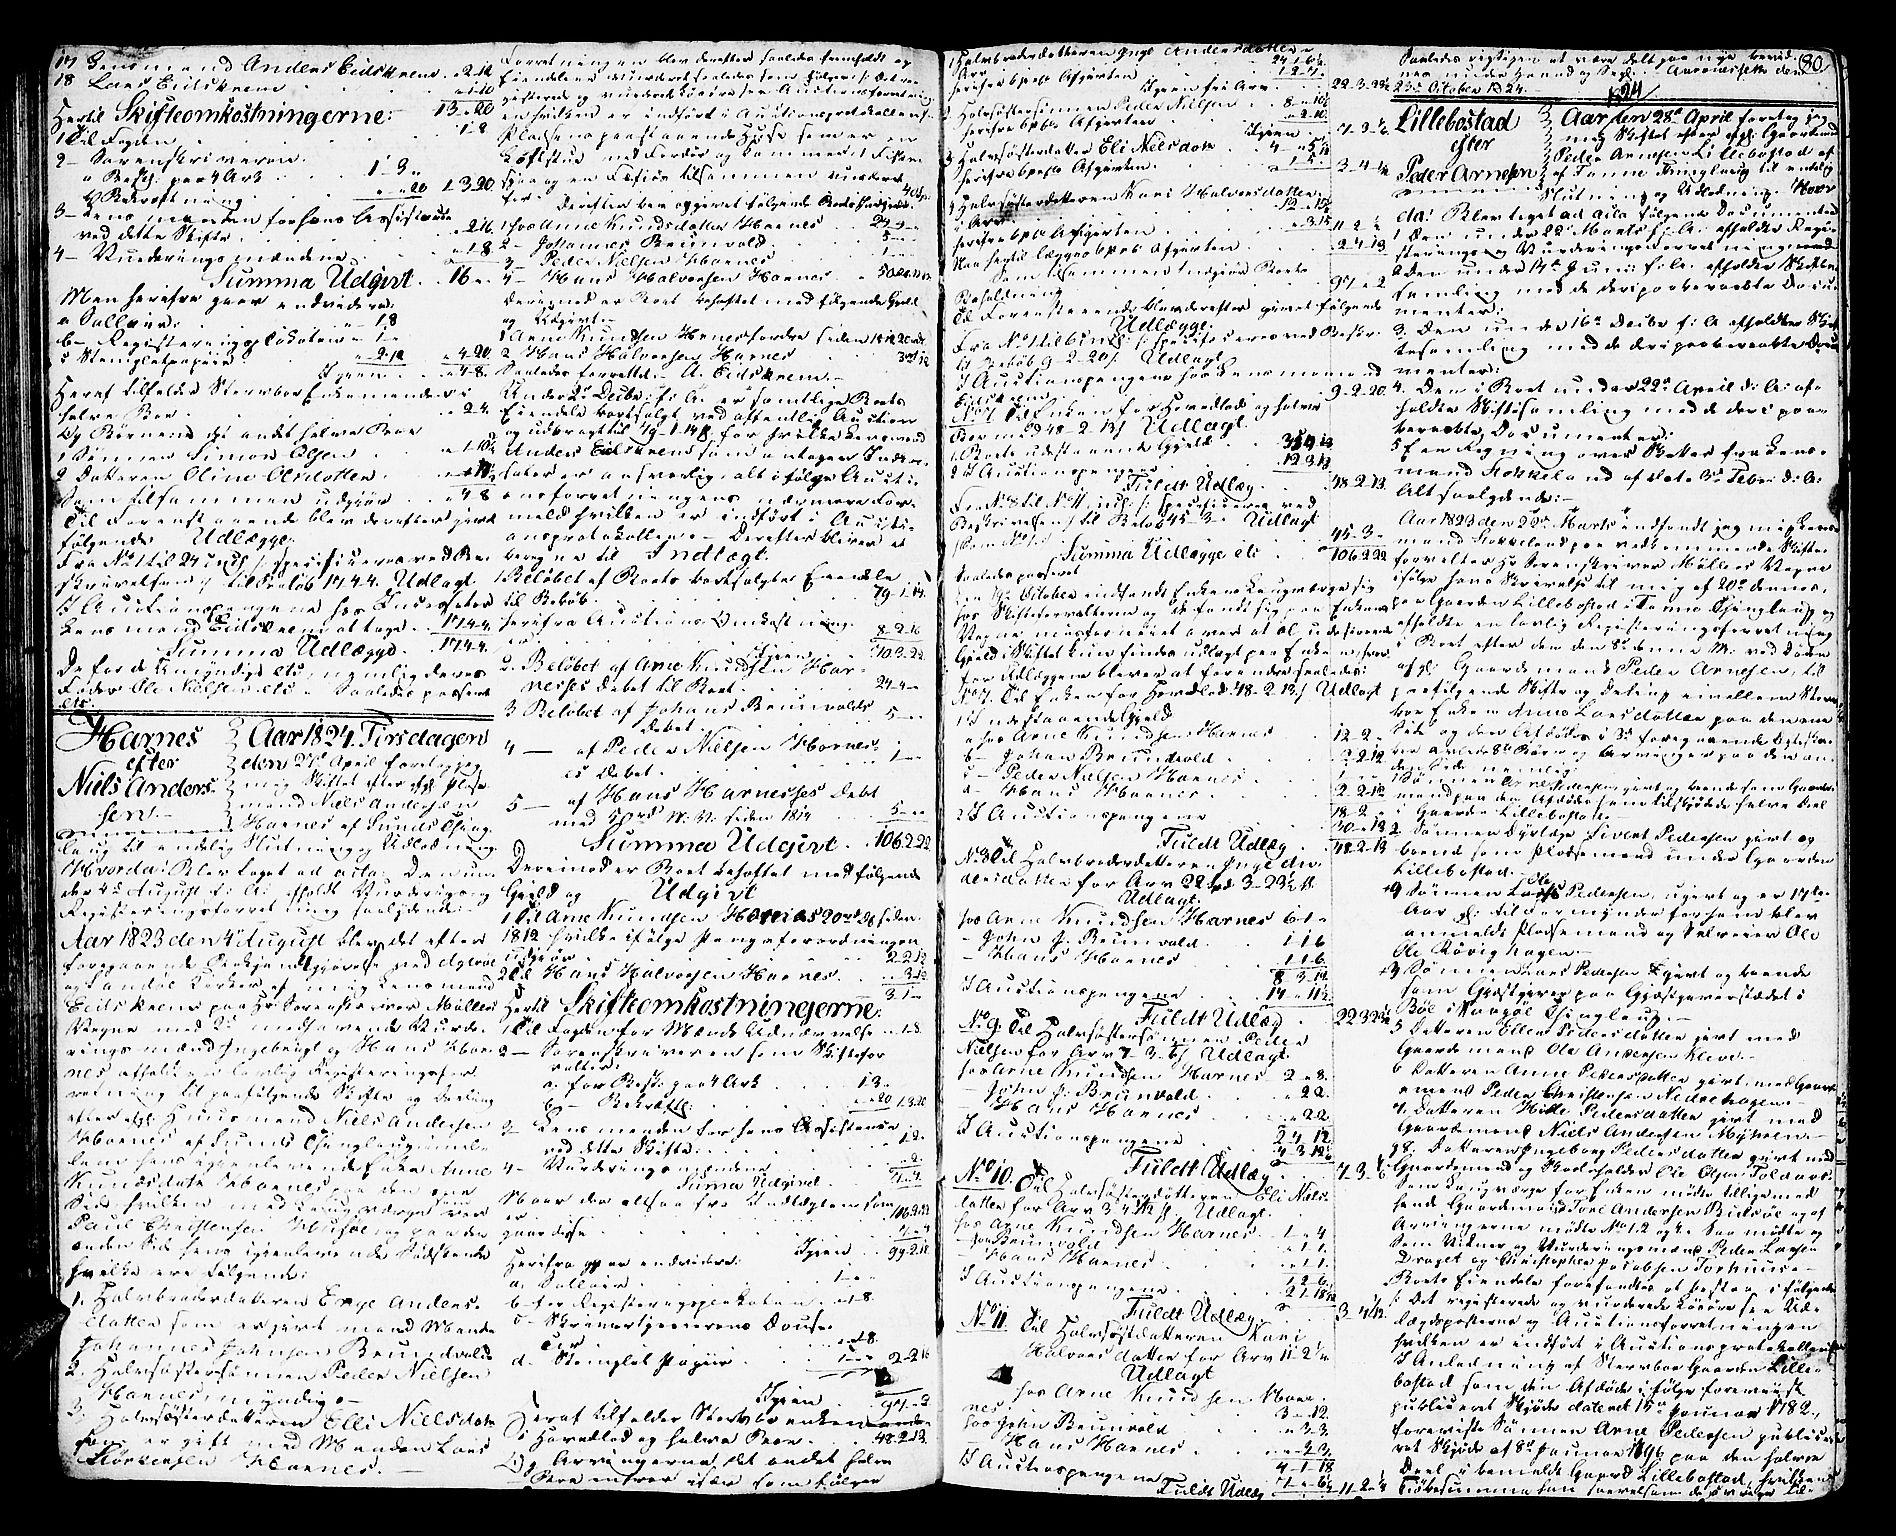 SAT, Romsdal sorenskriveri, 3/3A/L0016: Skifteutlodnings Protokoll 2, 1823-1831, p. 80